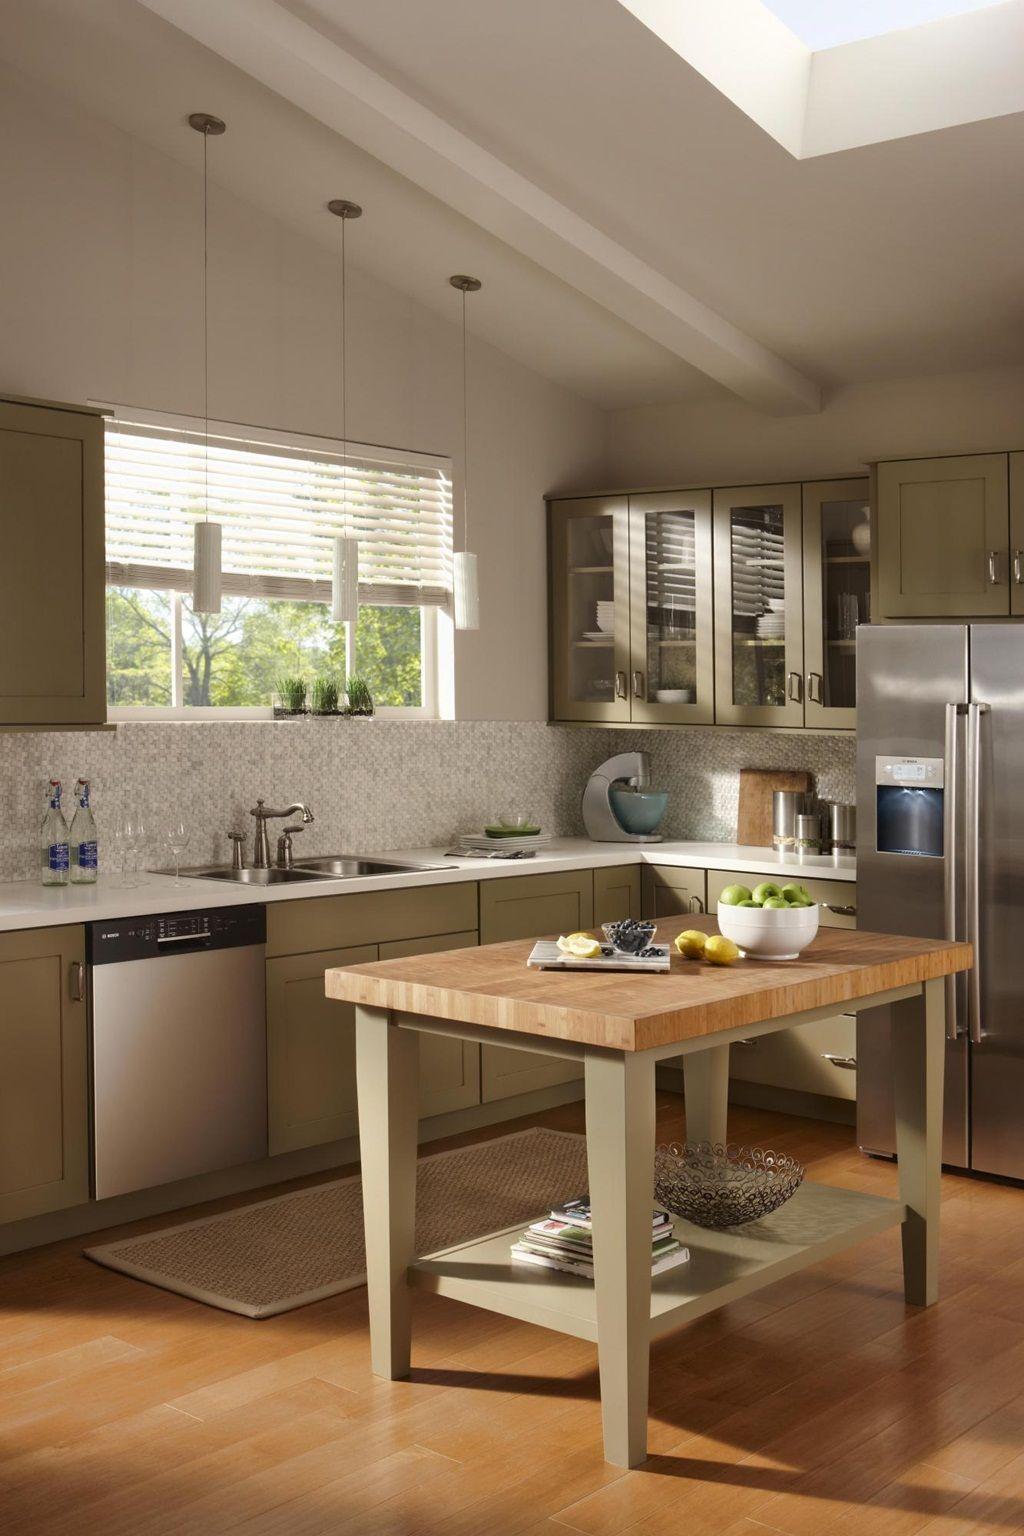 Kitchen Furniture Ideas u Decorate with Passion kitchen decor